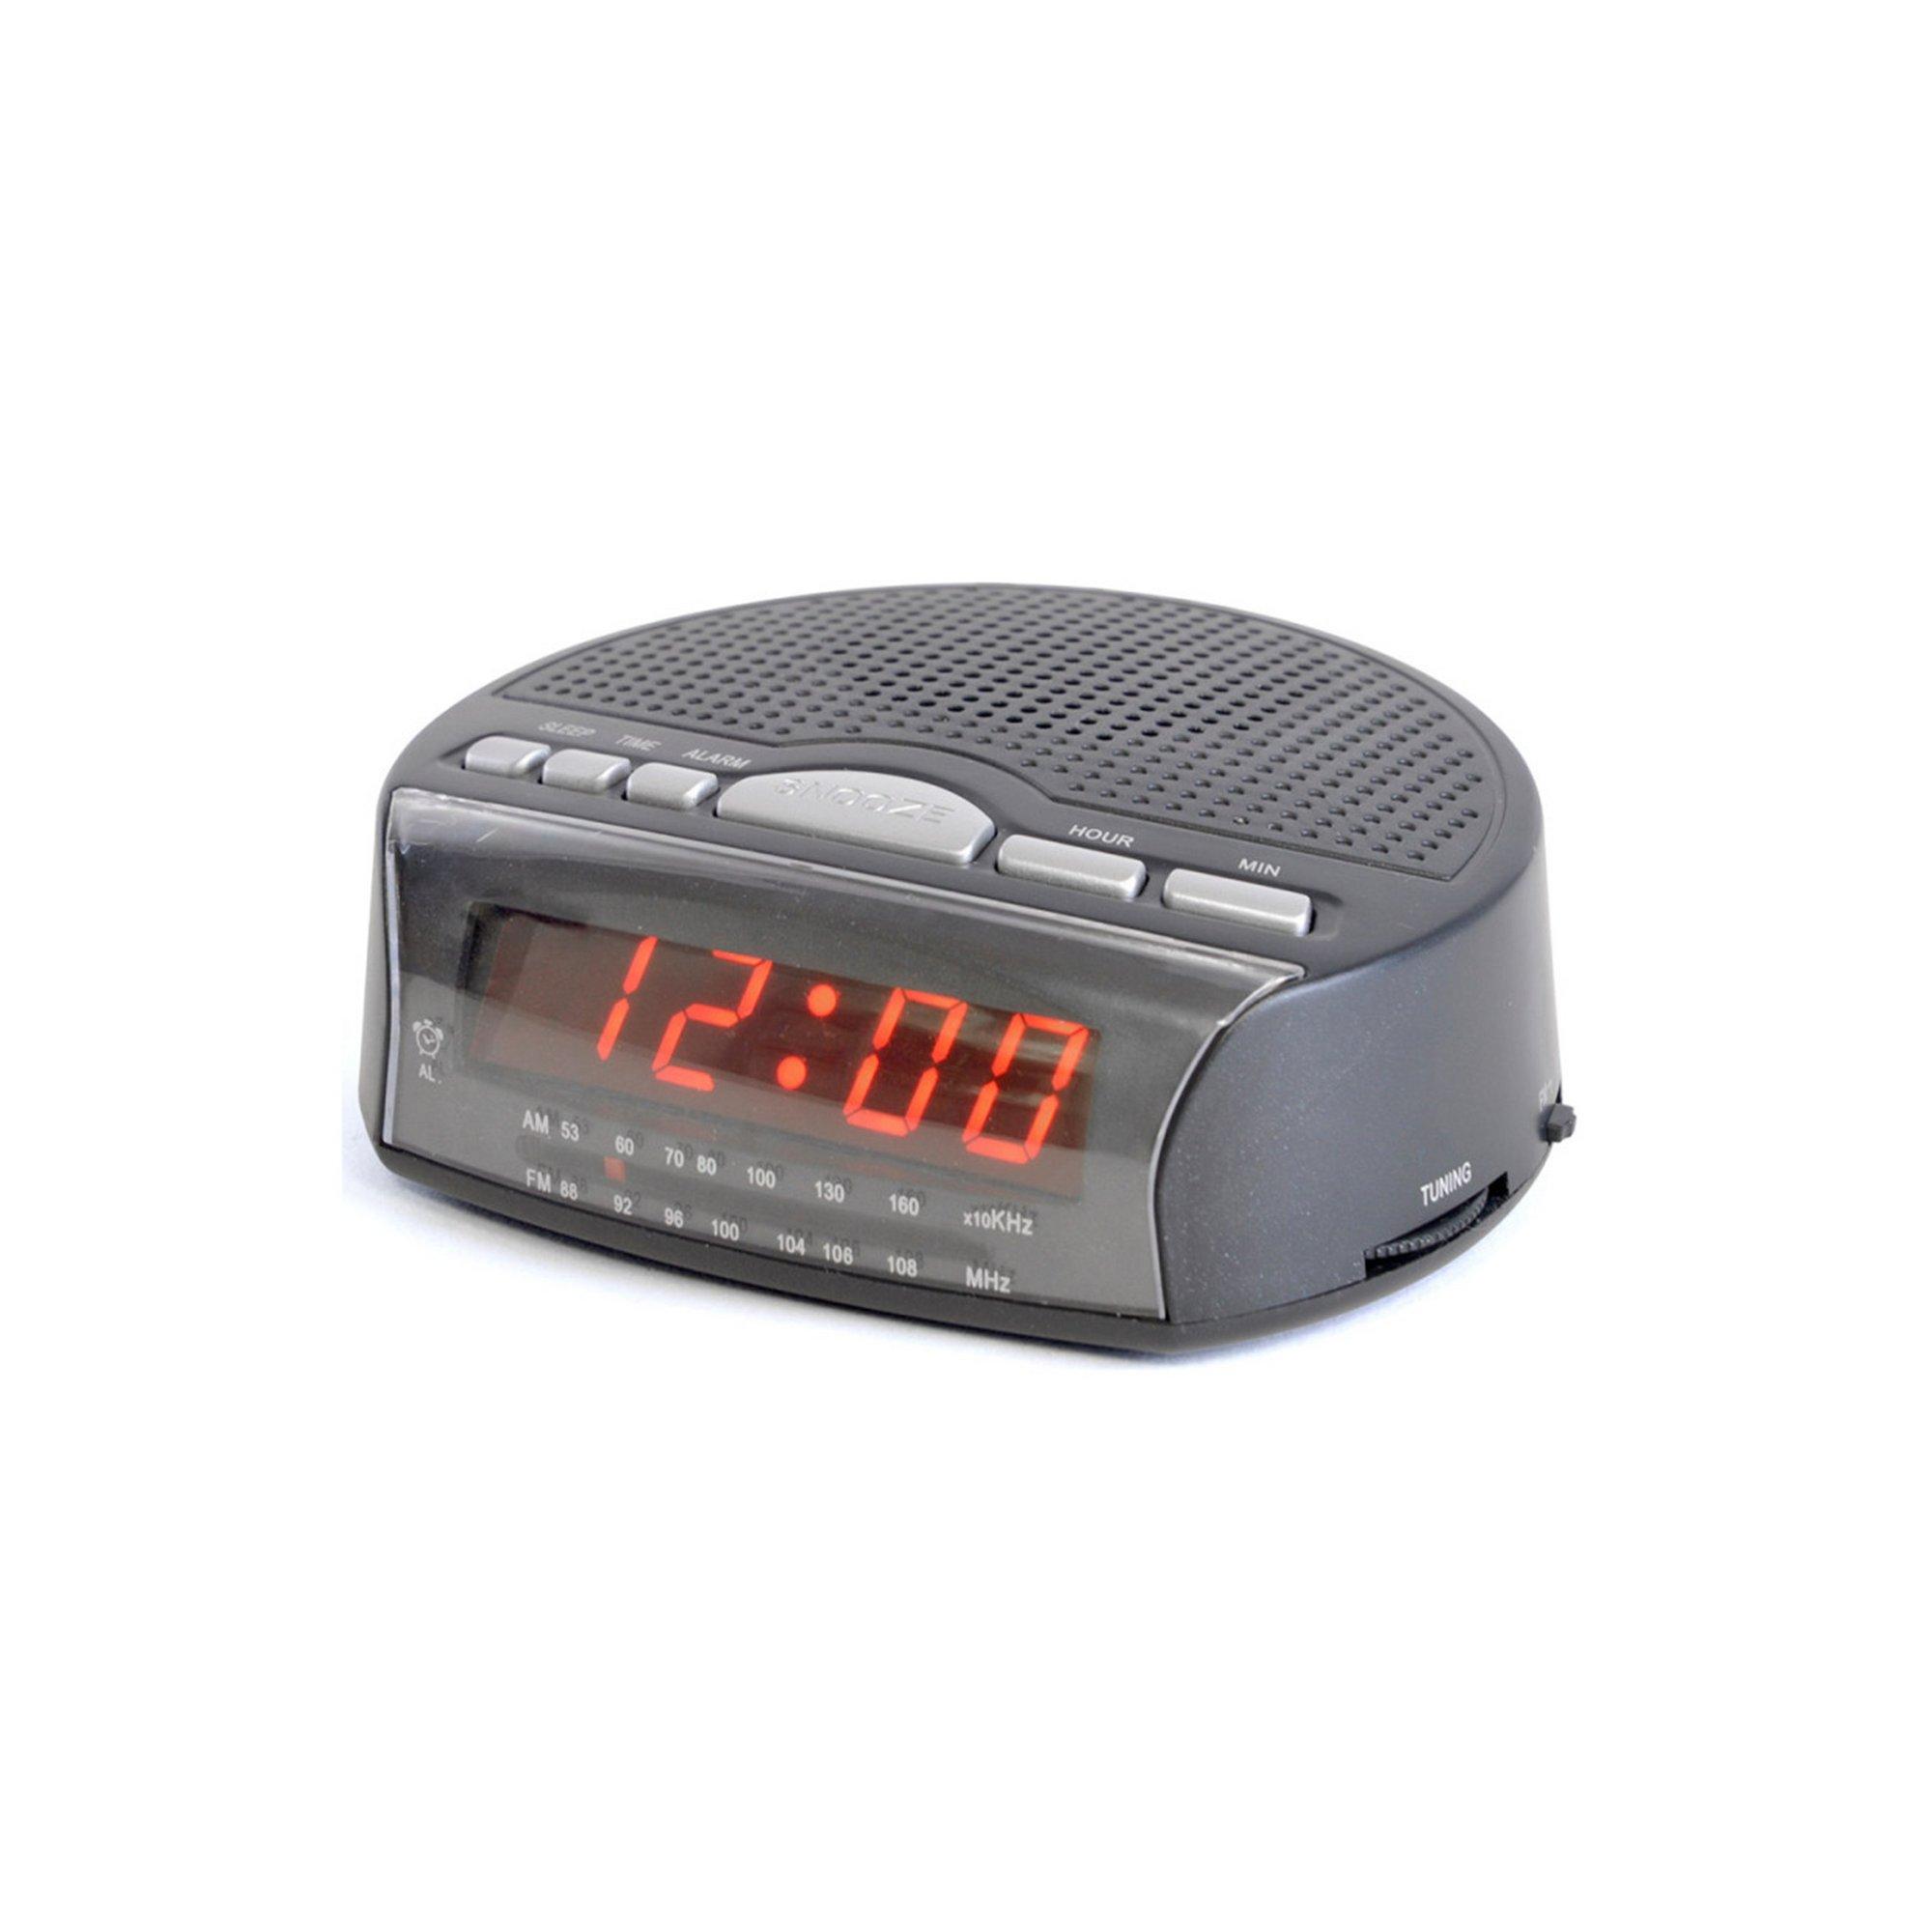 Image of Lloytron Daybreak Alarm Clock Radio